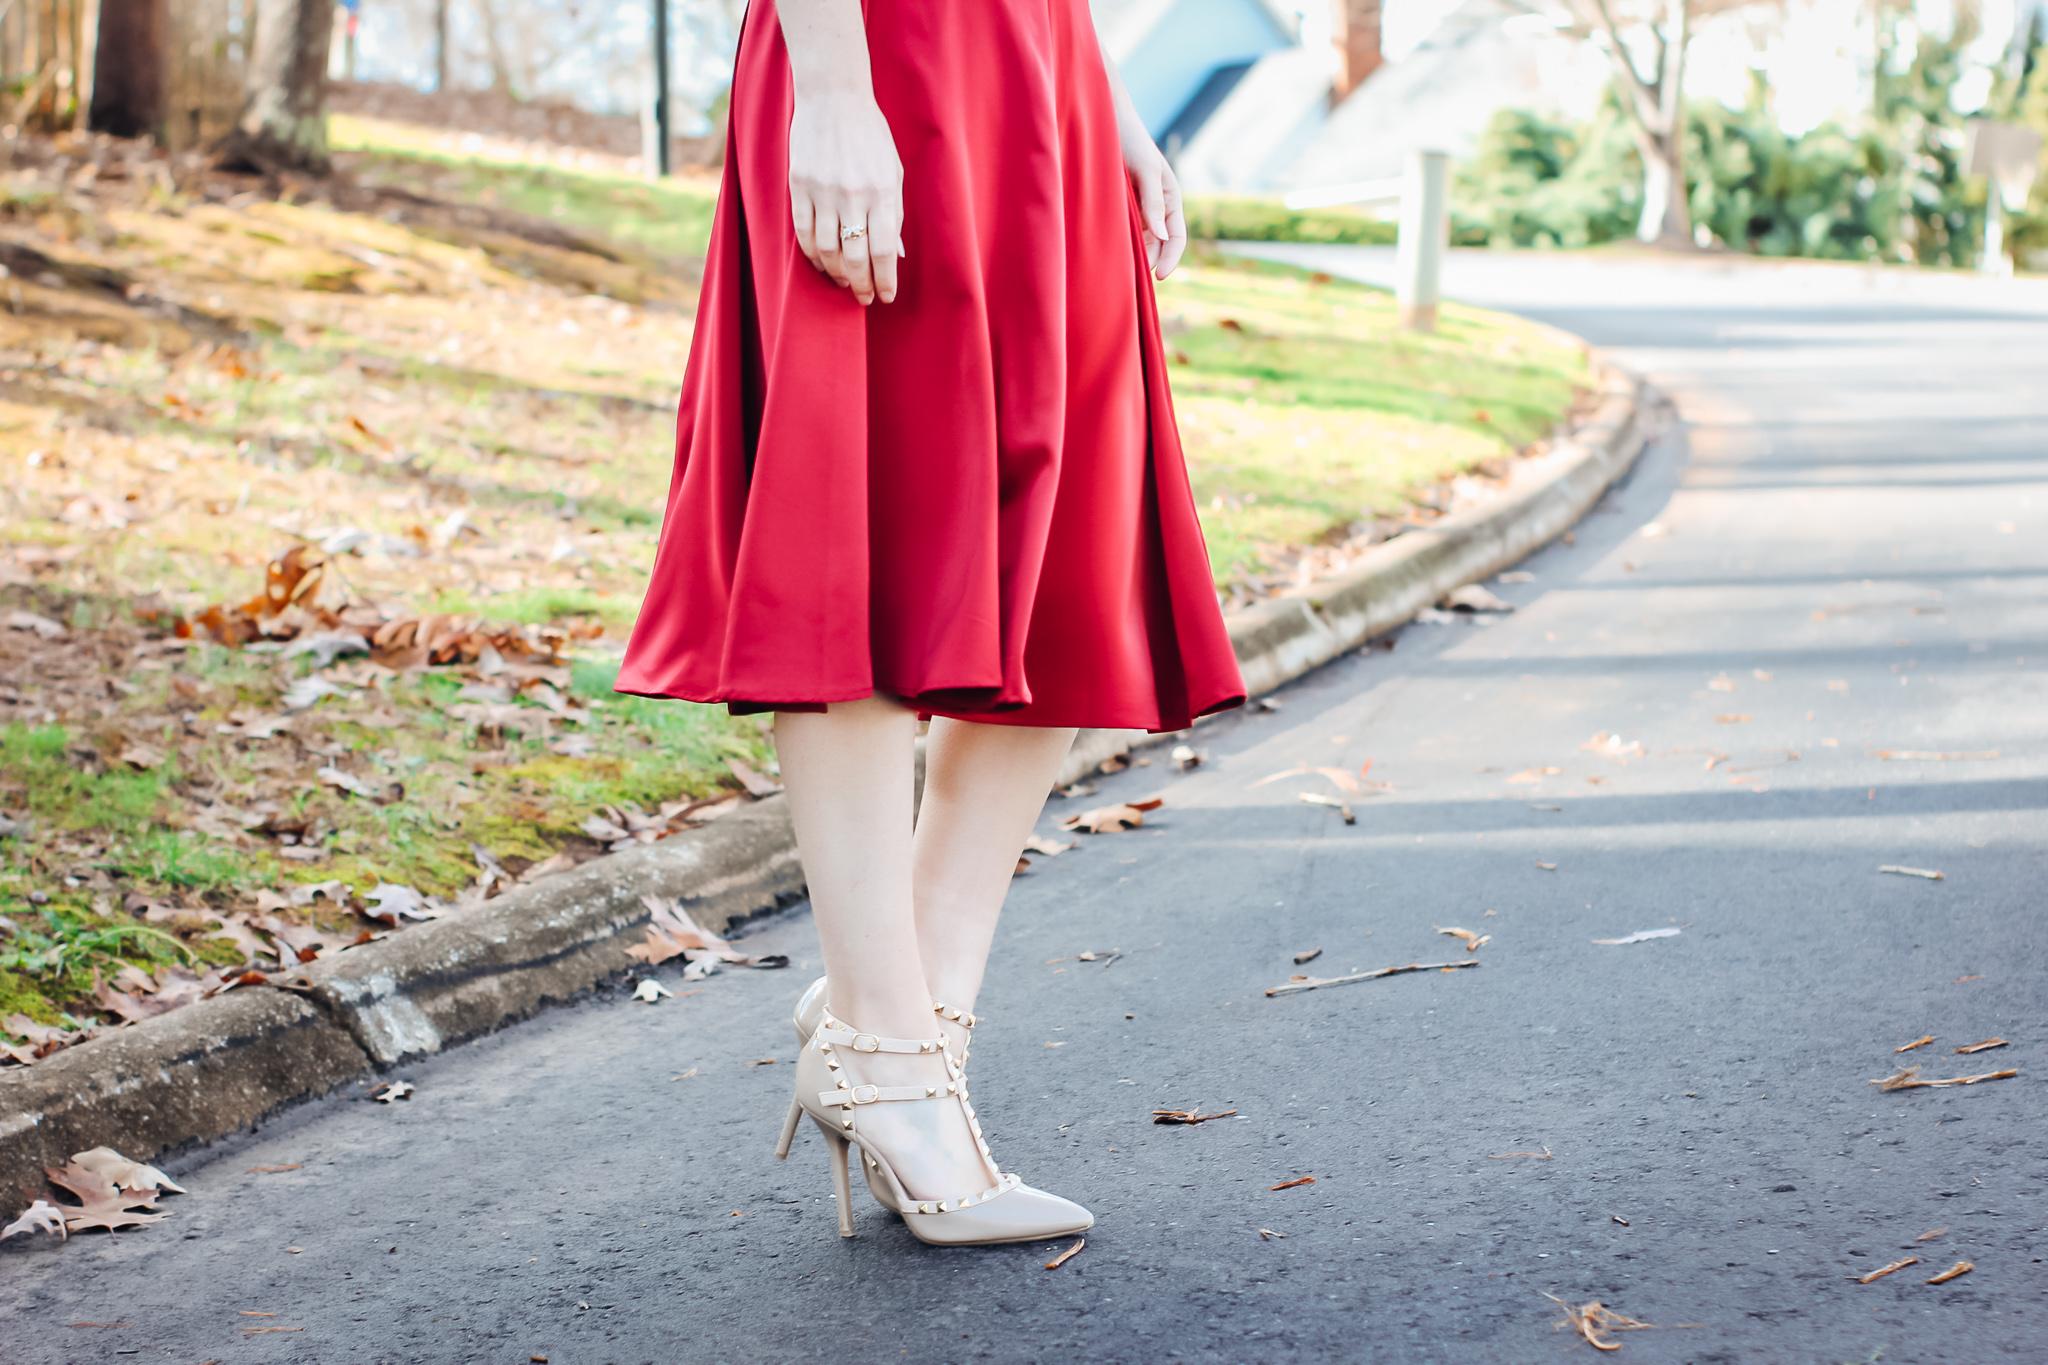 Red Satin Midi Skirt Close Up View